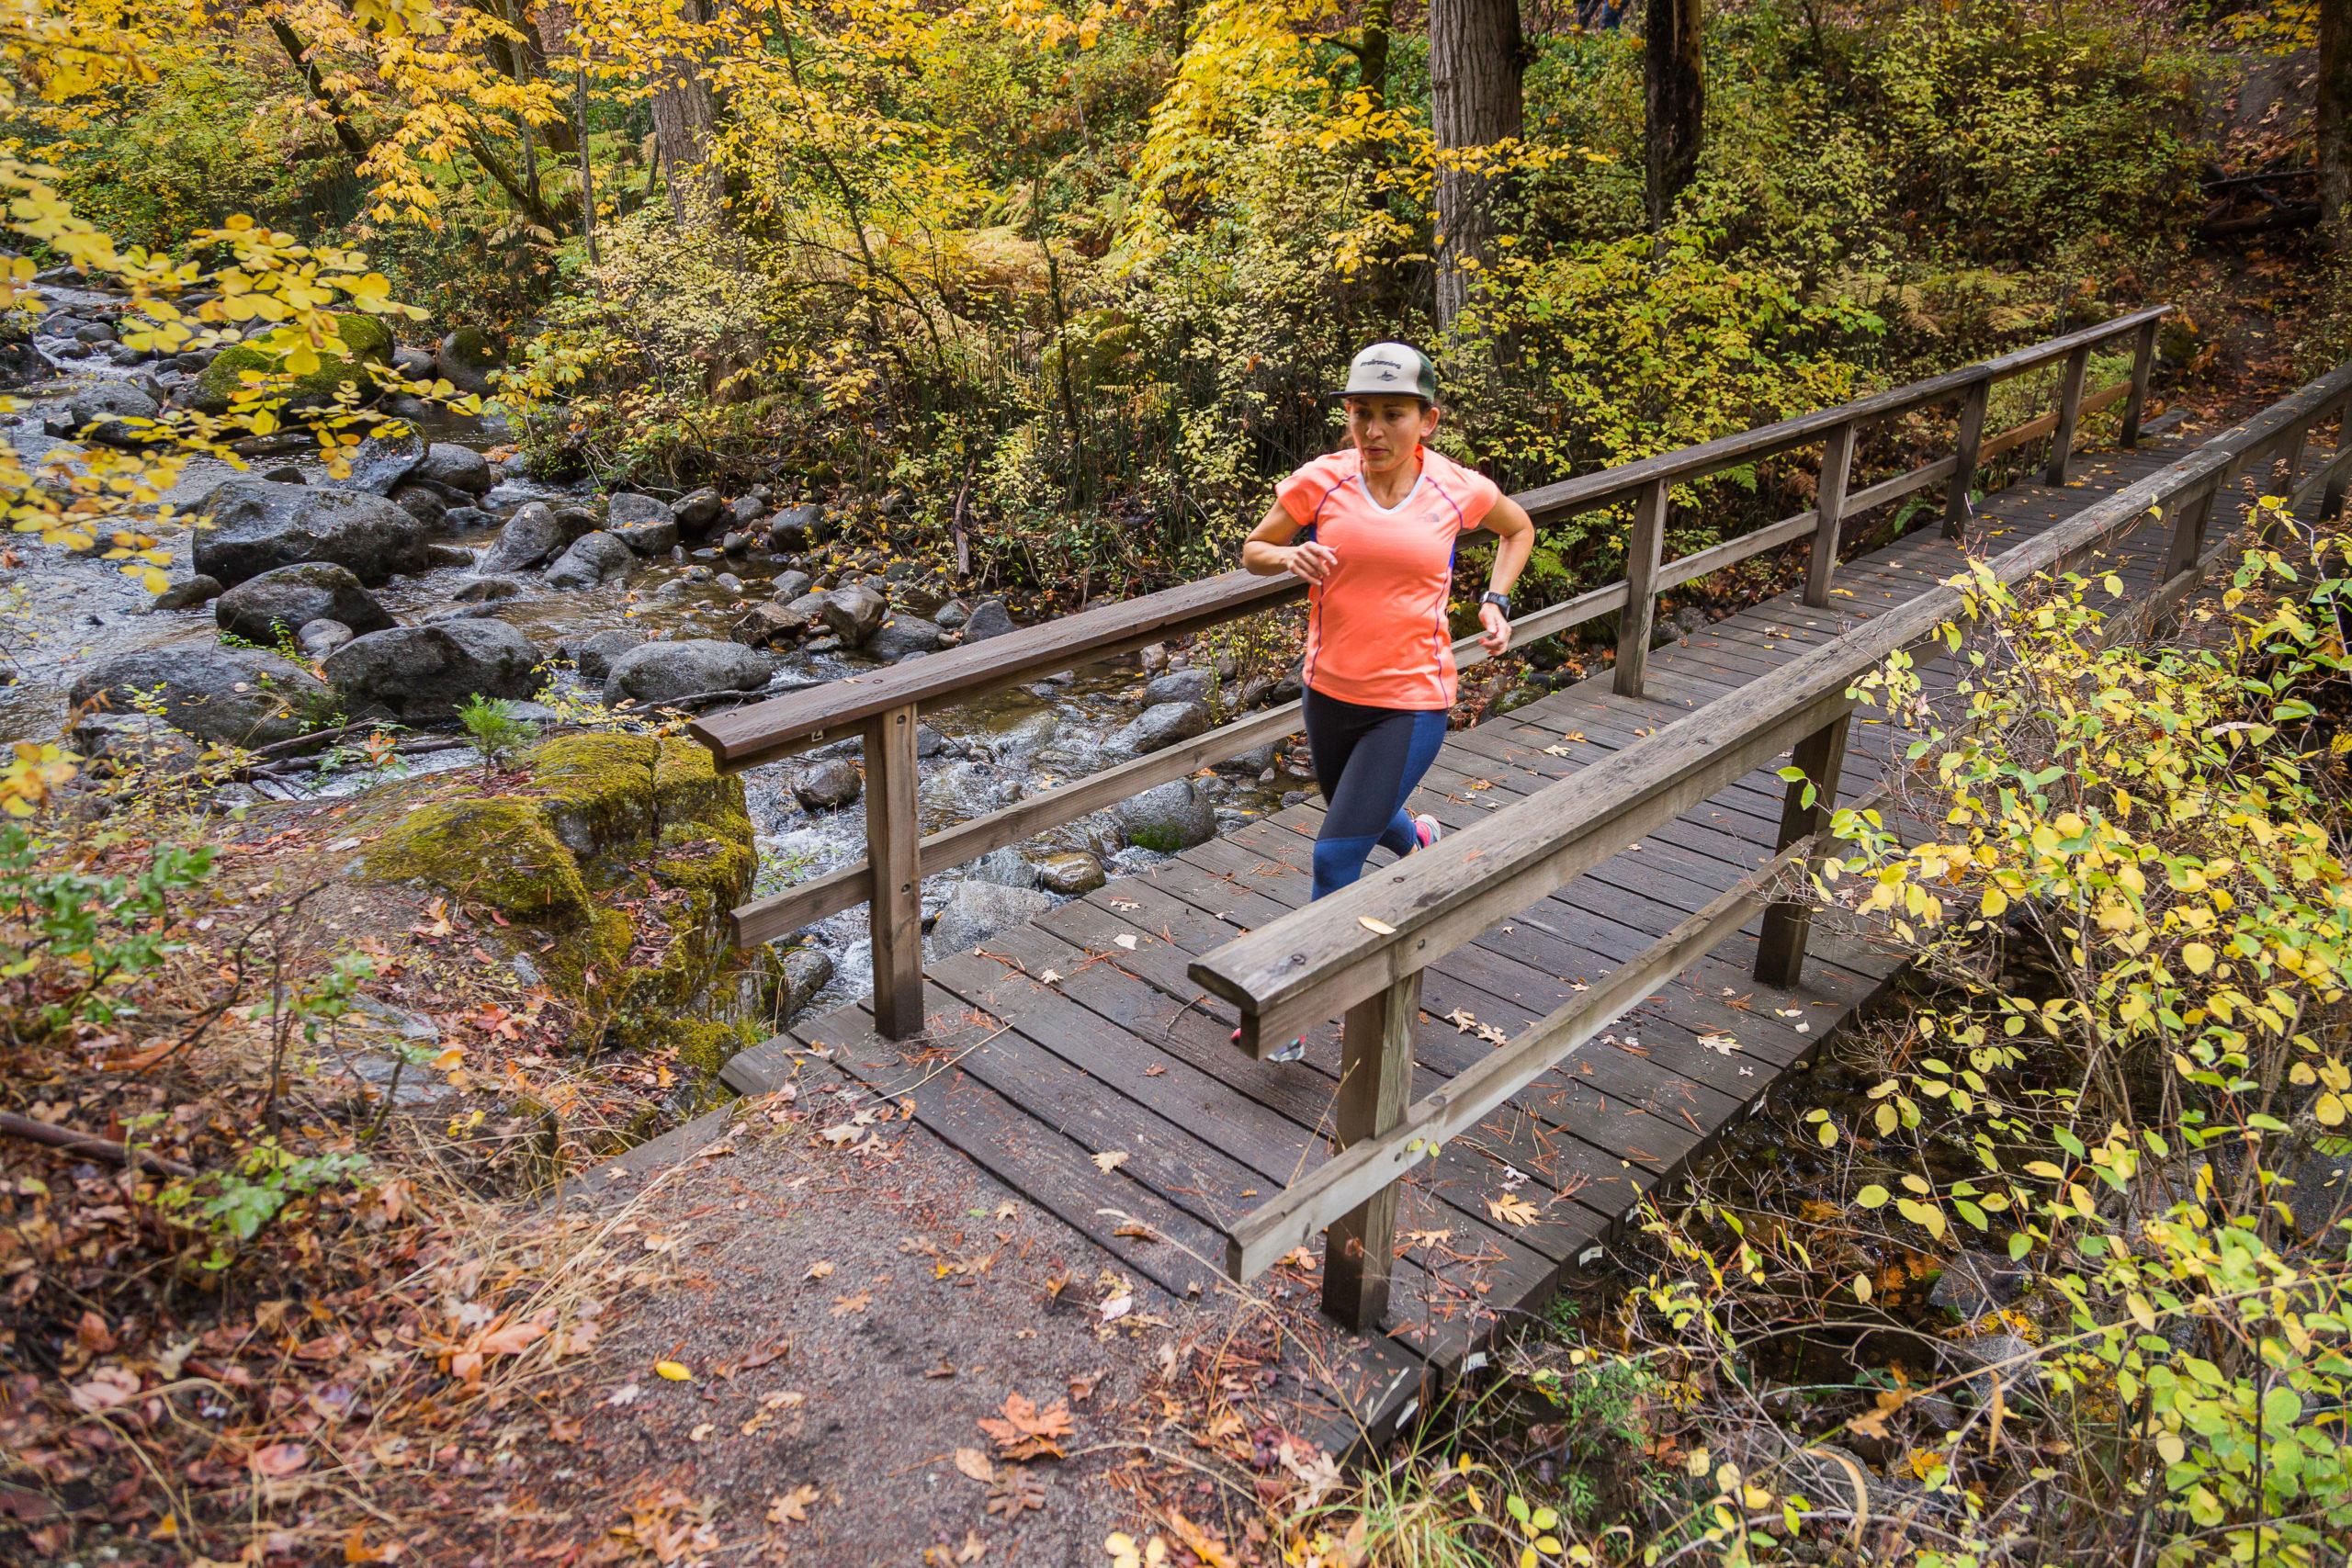 A Trail runner in Ashland's Lithia Park.